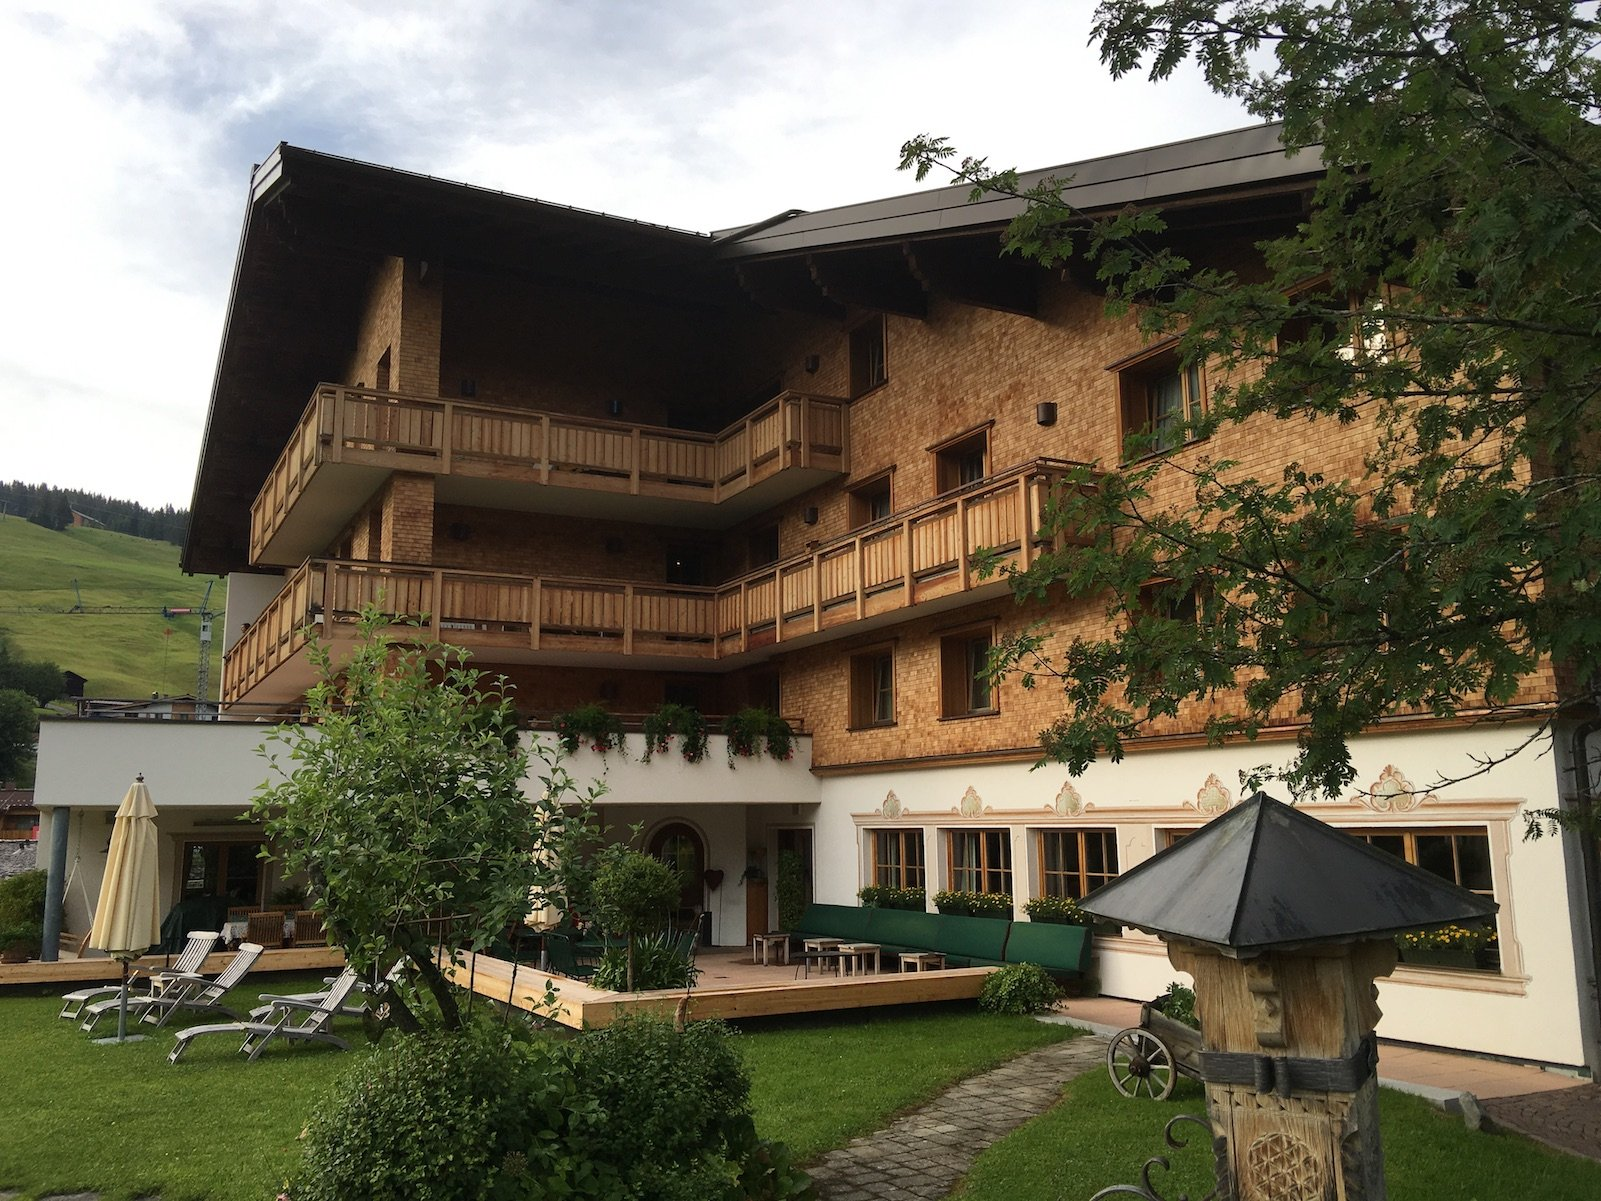 Das Hotel Aurora in Lech am Arlberg